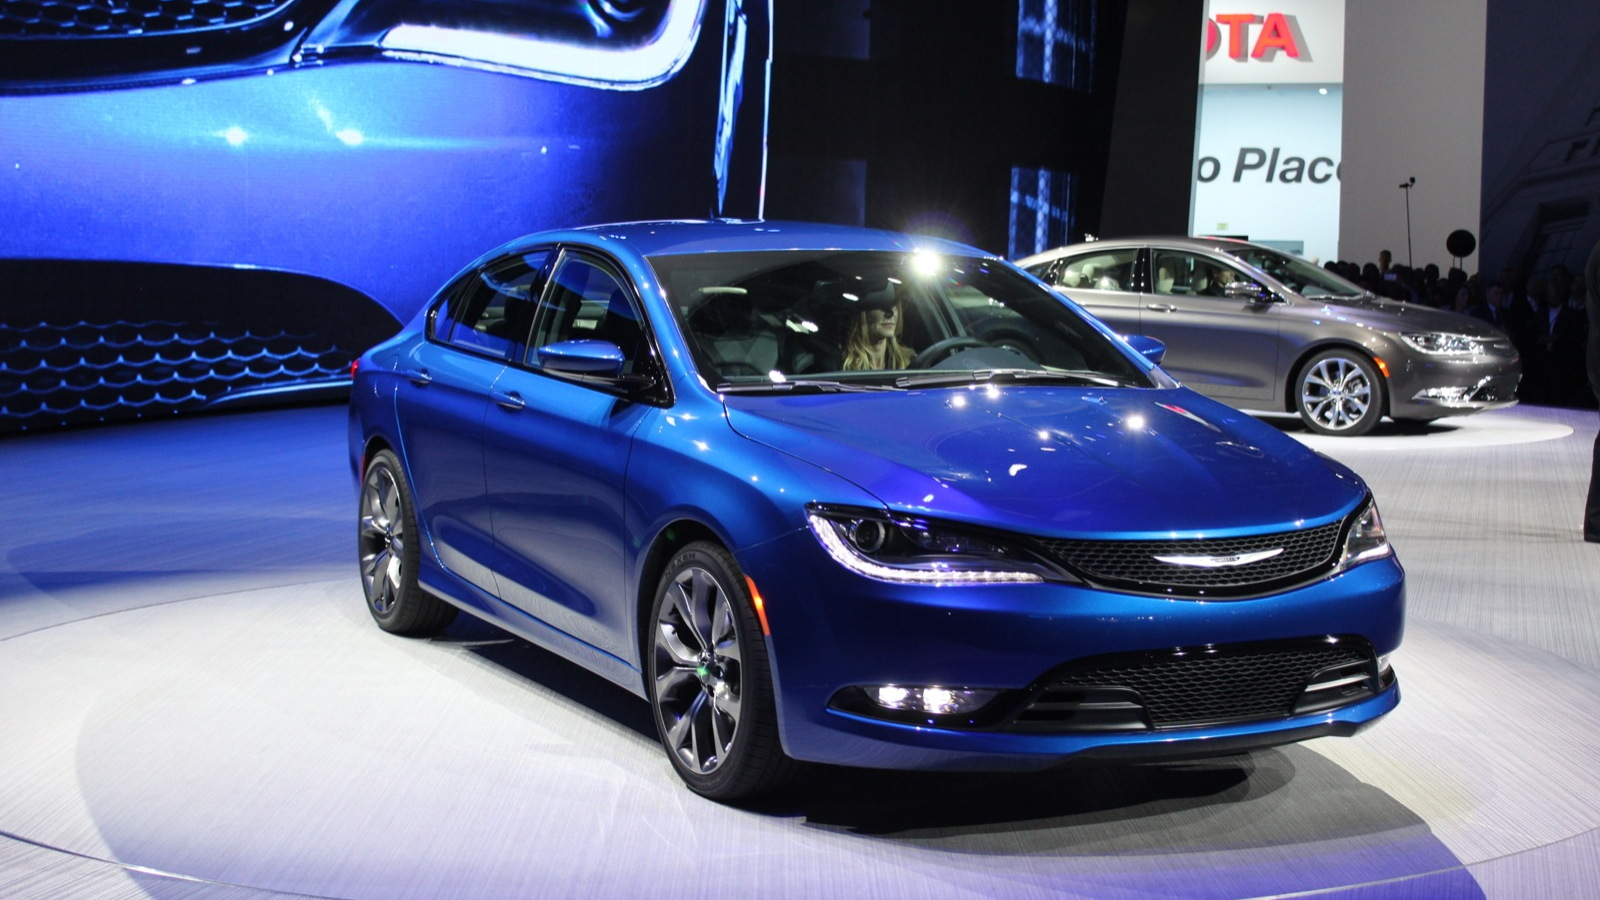 2015 Chrysler 200  -  2014 Detroit Auto Show